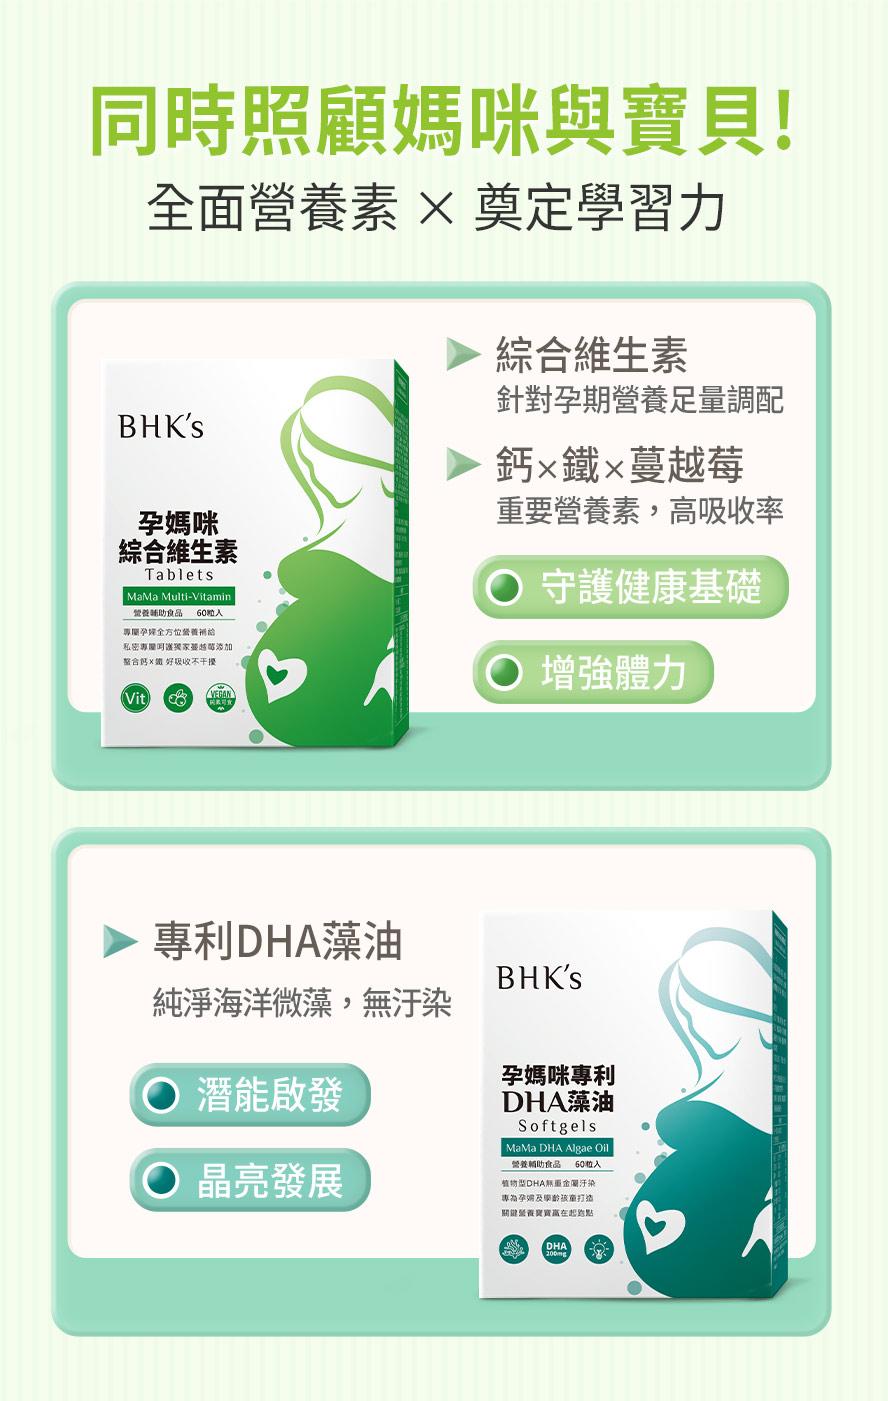 BHK孕婦綜合維他命+專利DHA藻油,用心照顧孕婦與寶寶的健康狀況。